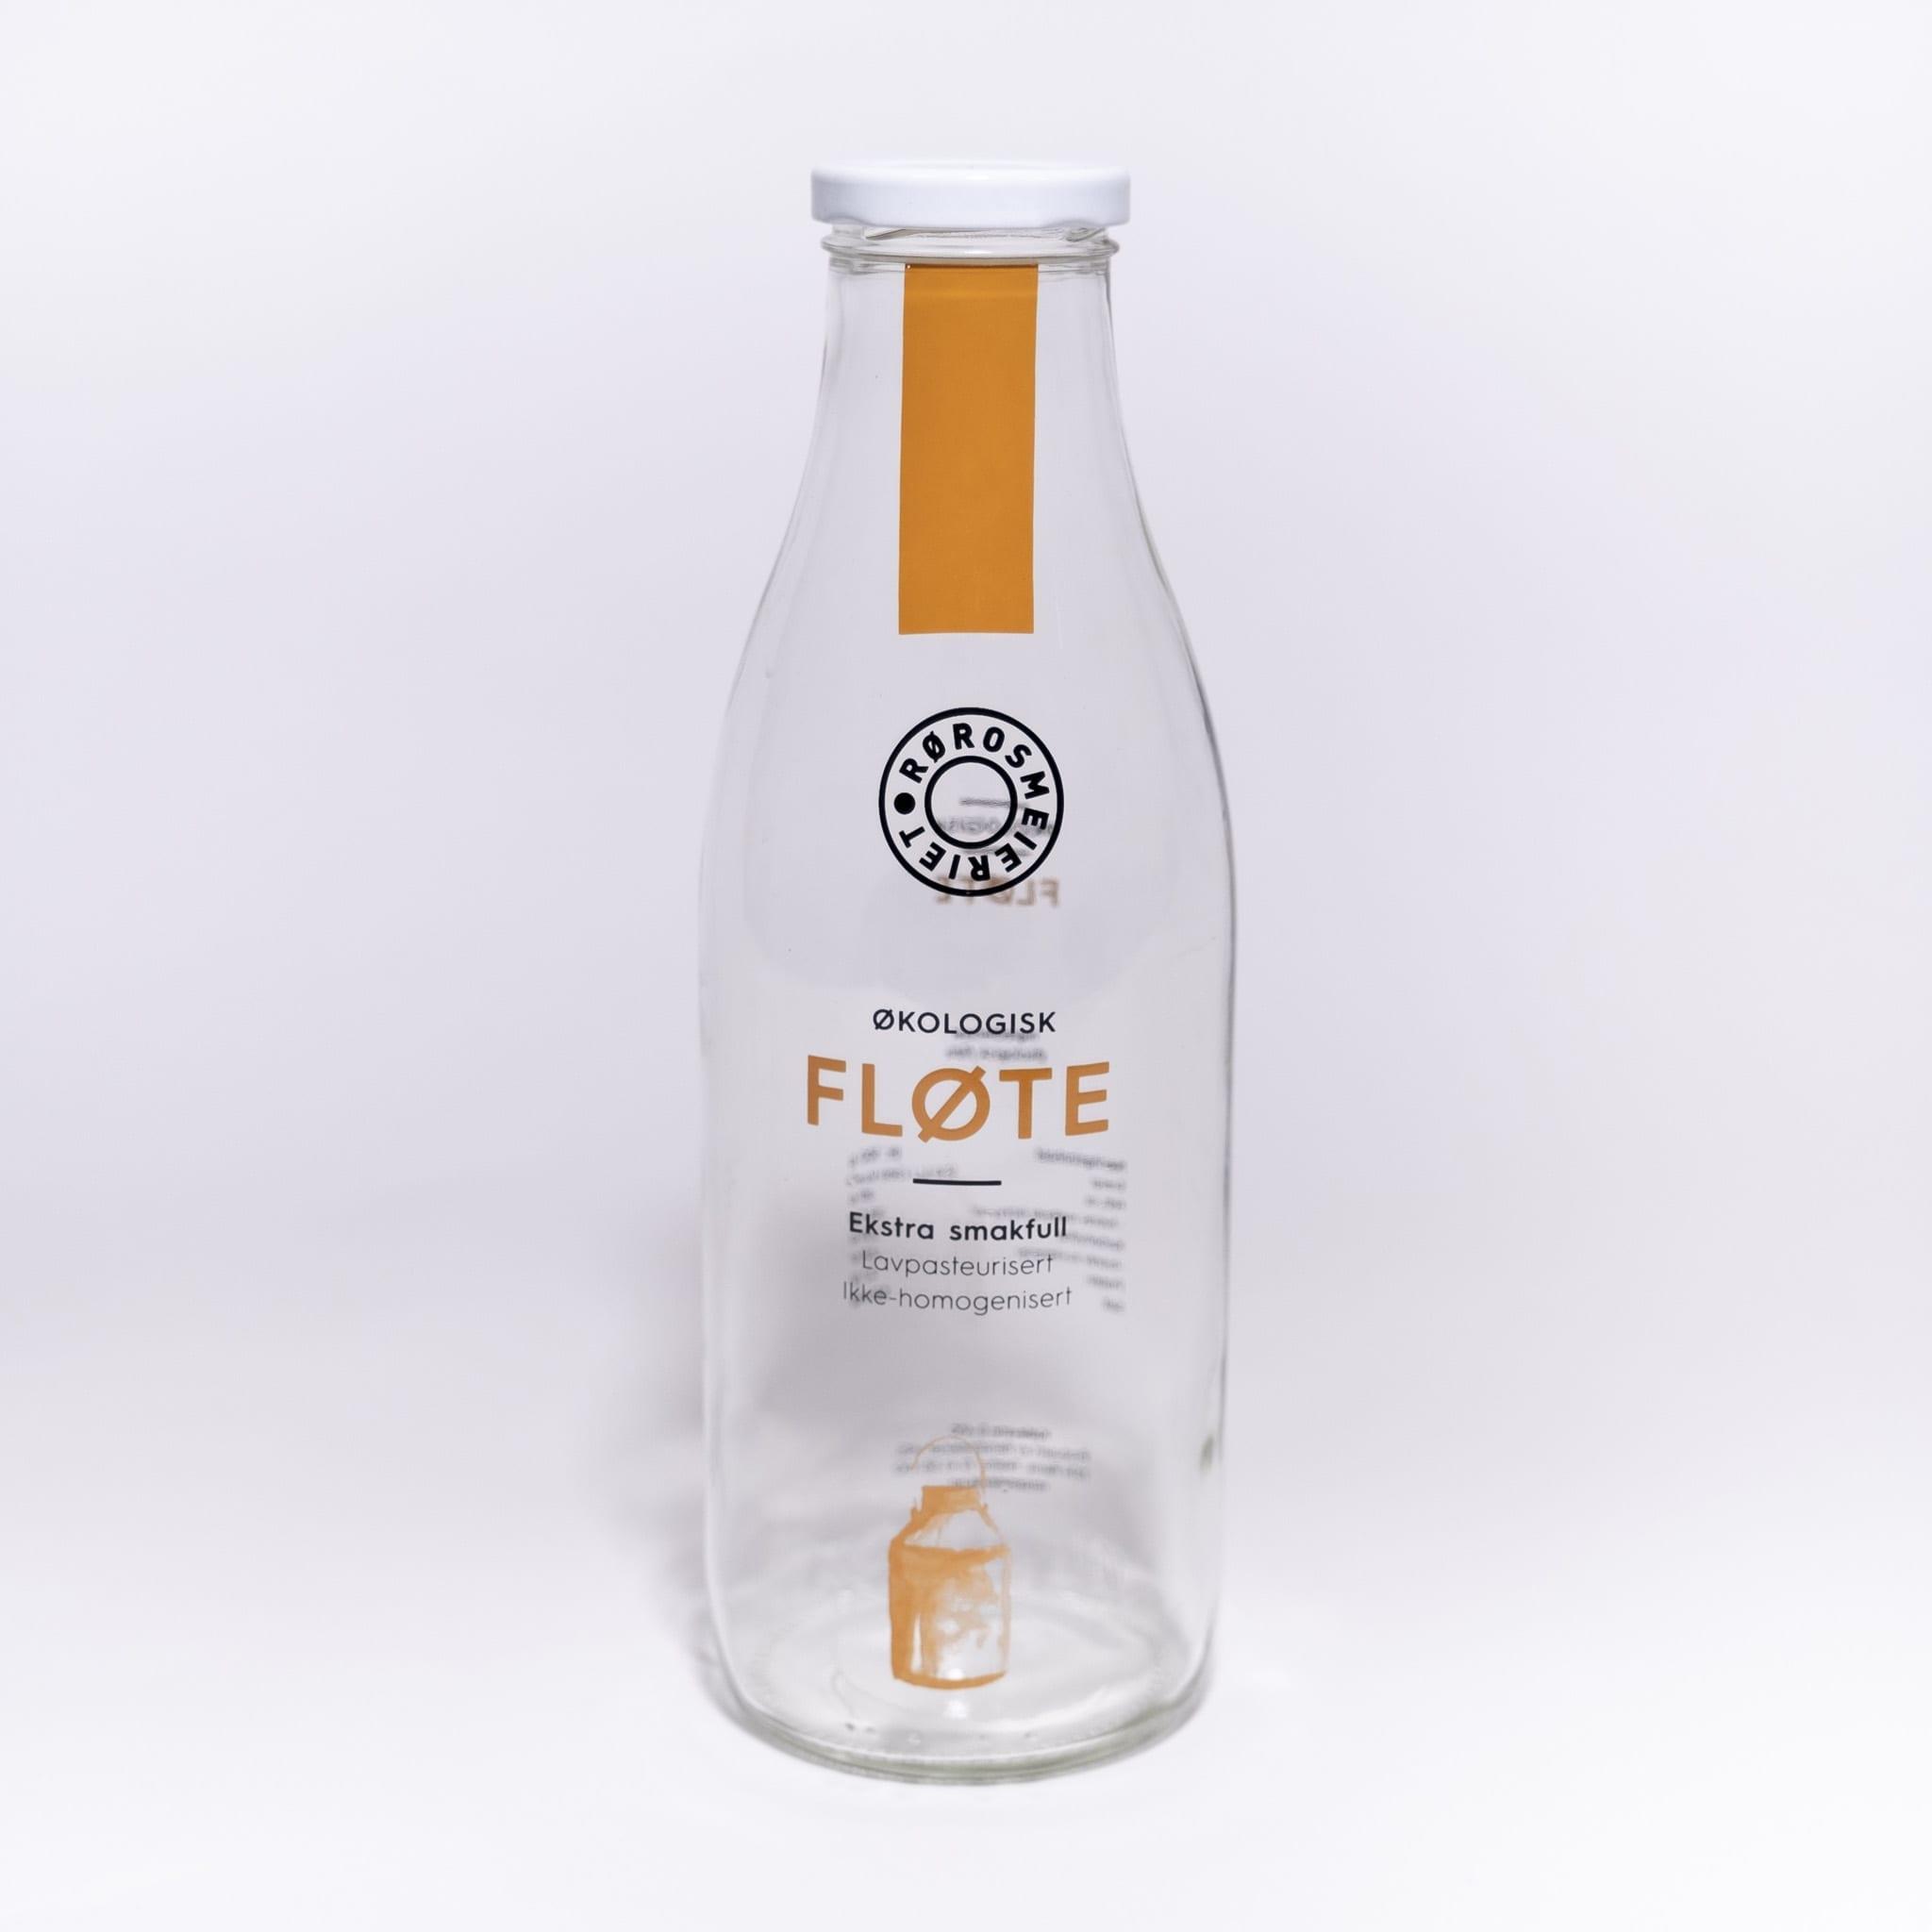 Glassflaske Rørosmeieriet